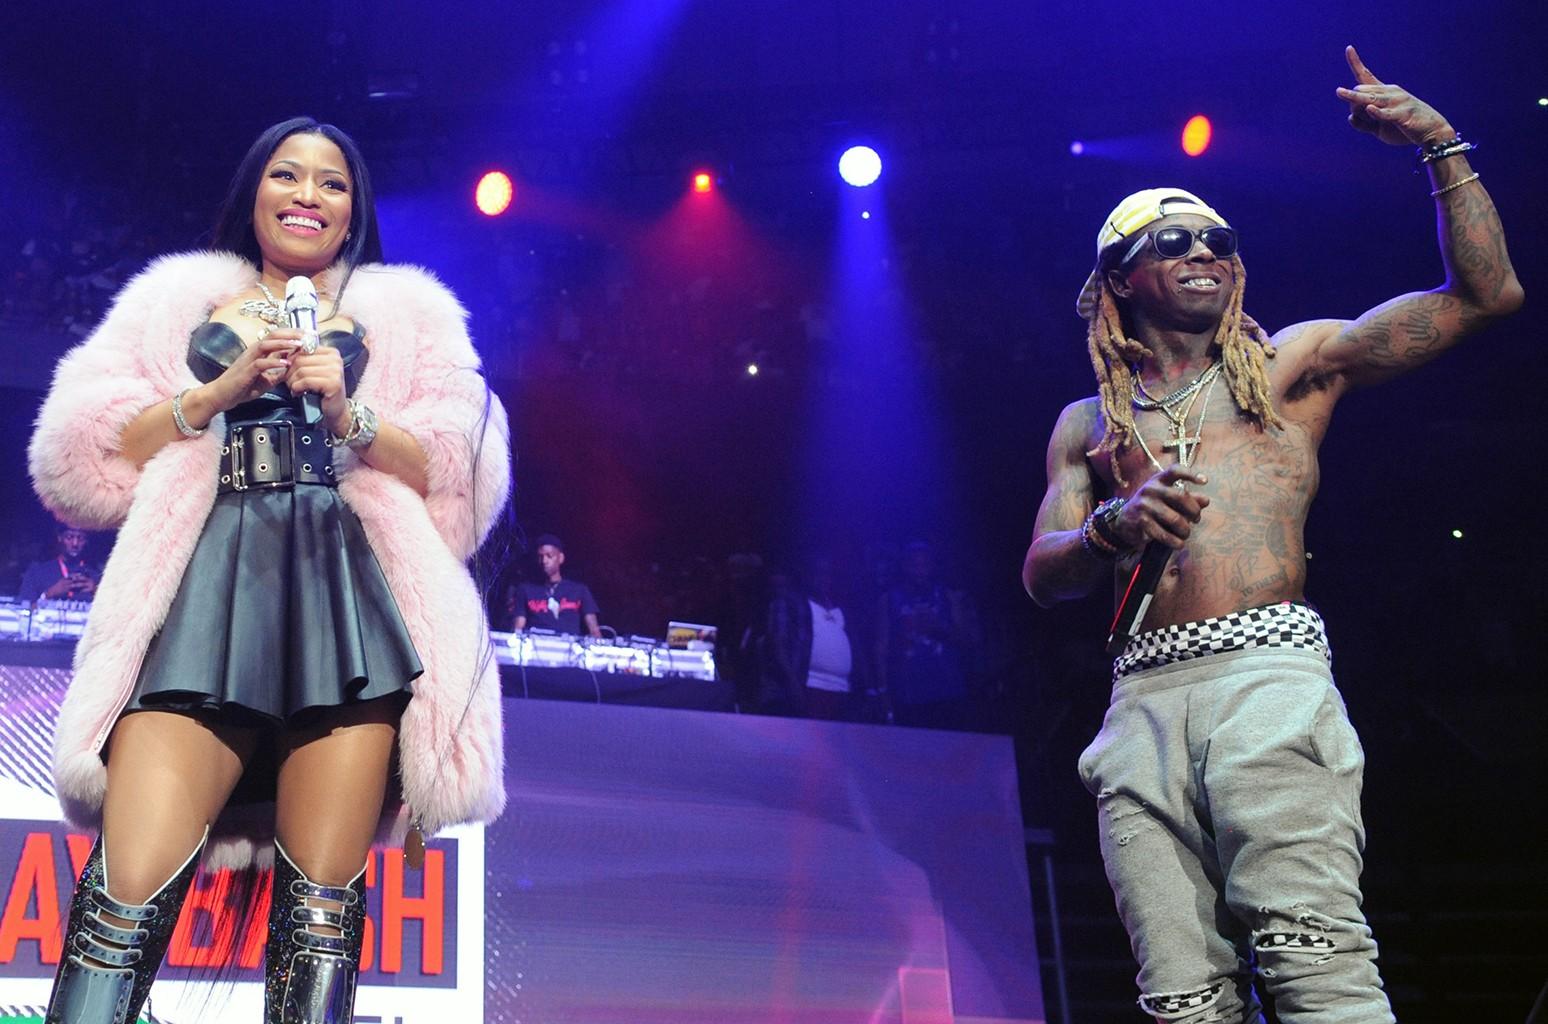 Drake, Nicki Minaj and More to Perform at 2017 Billboard